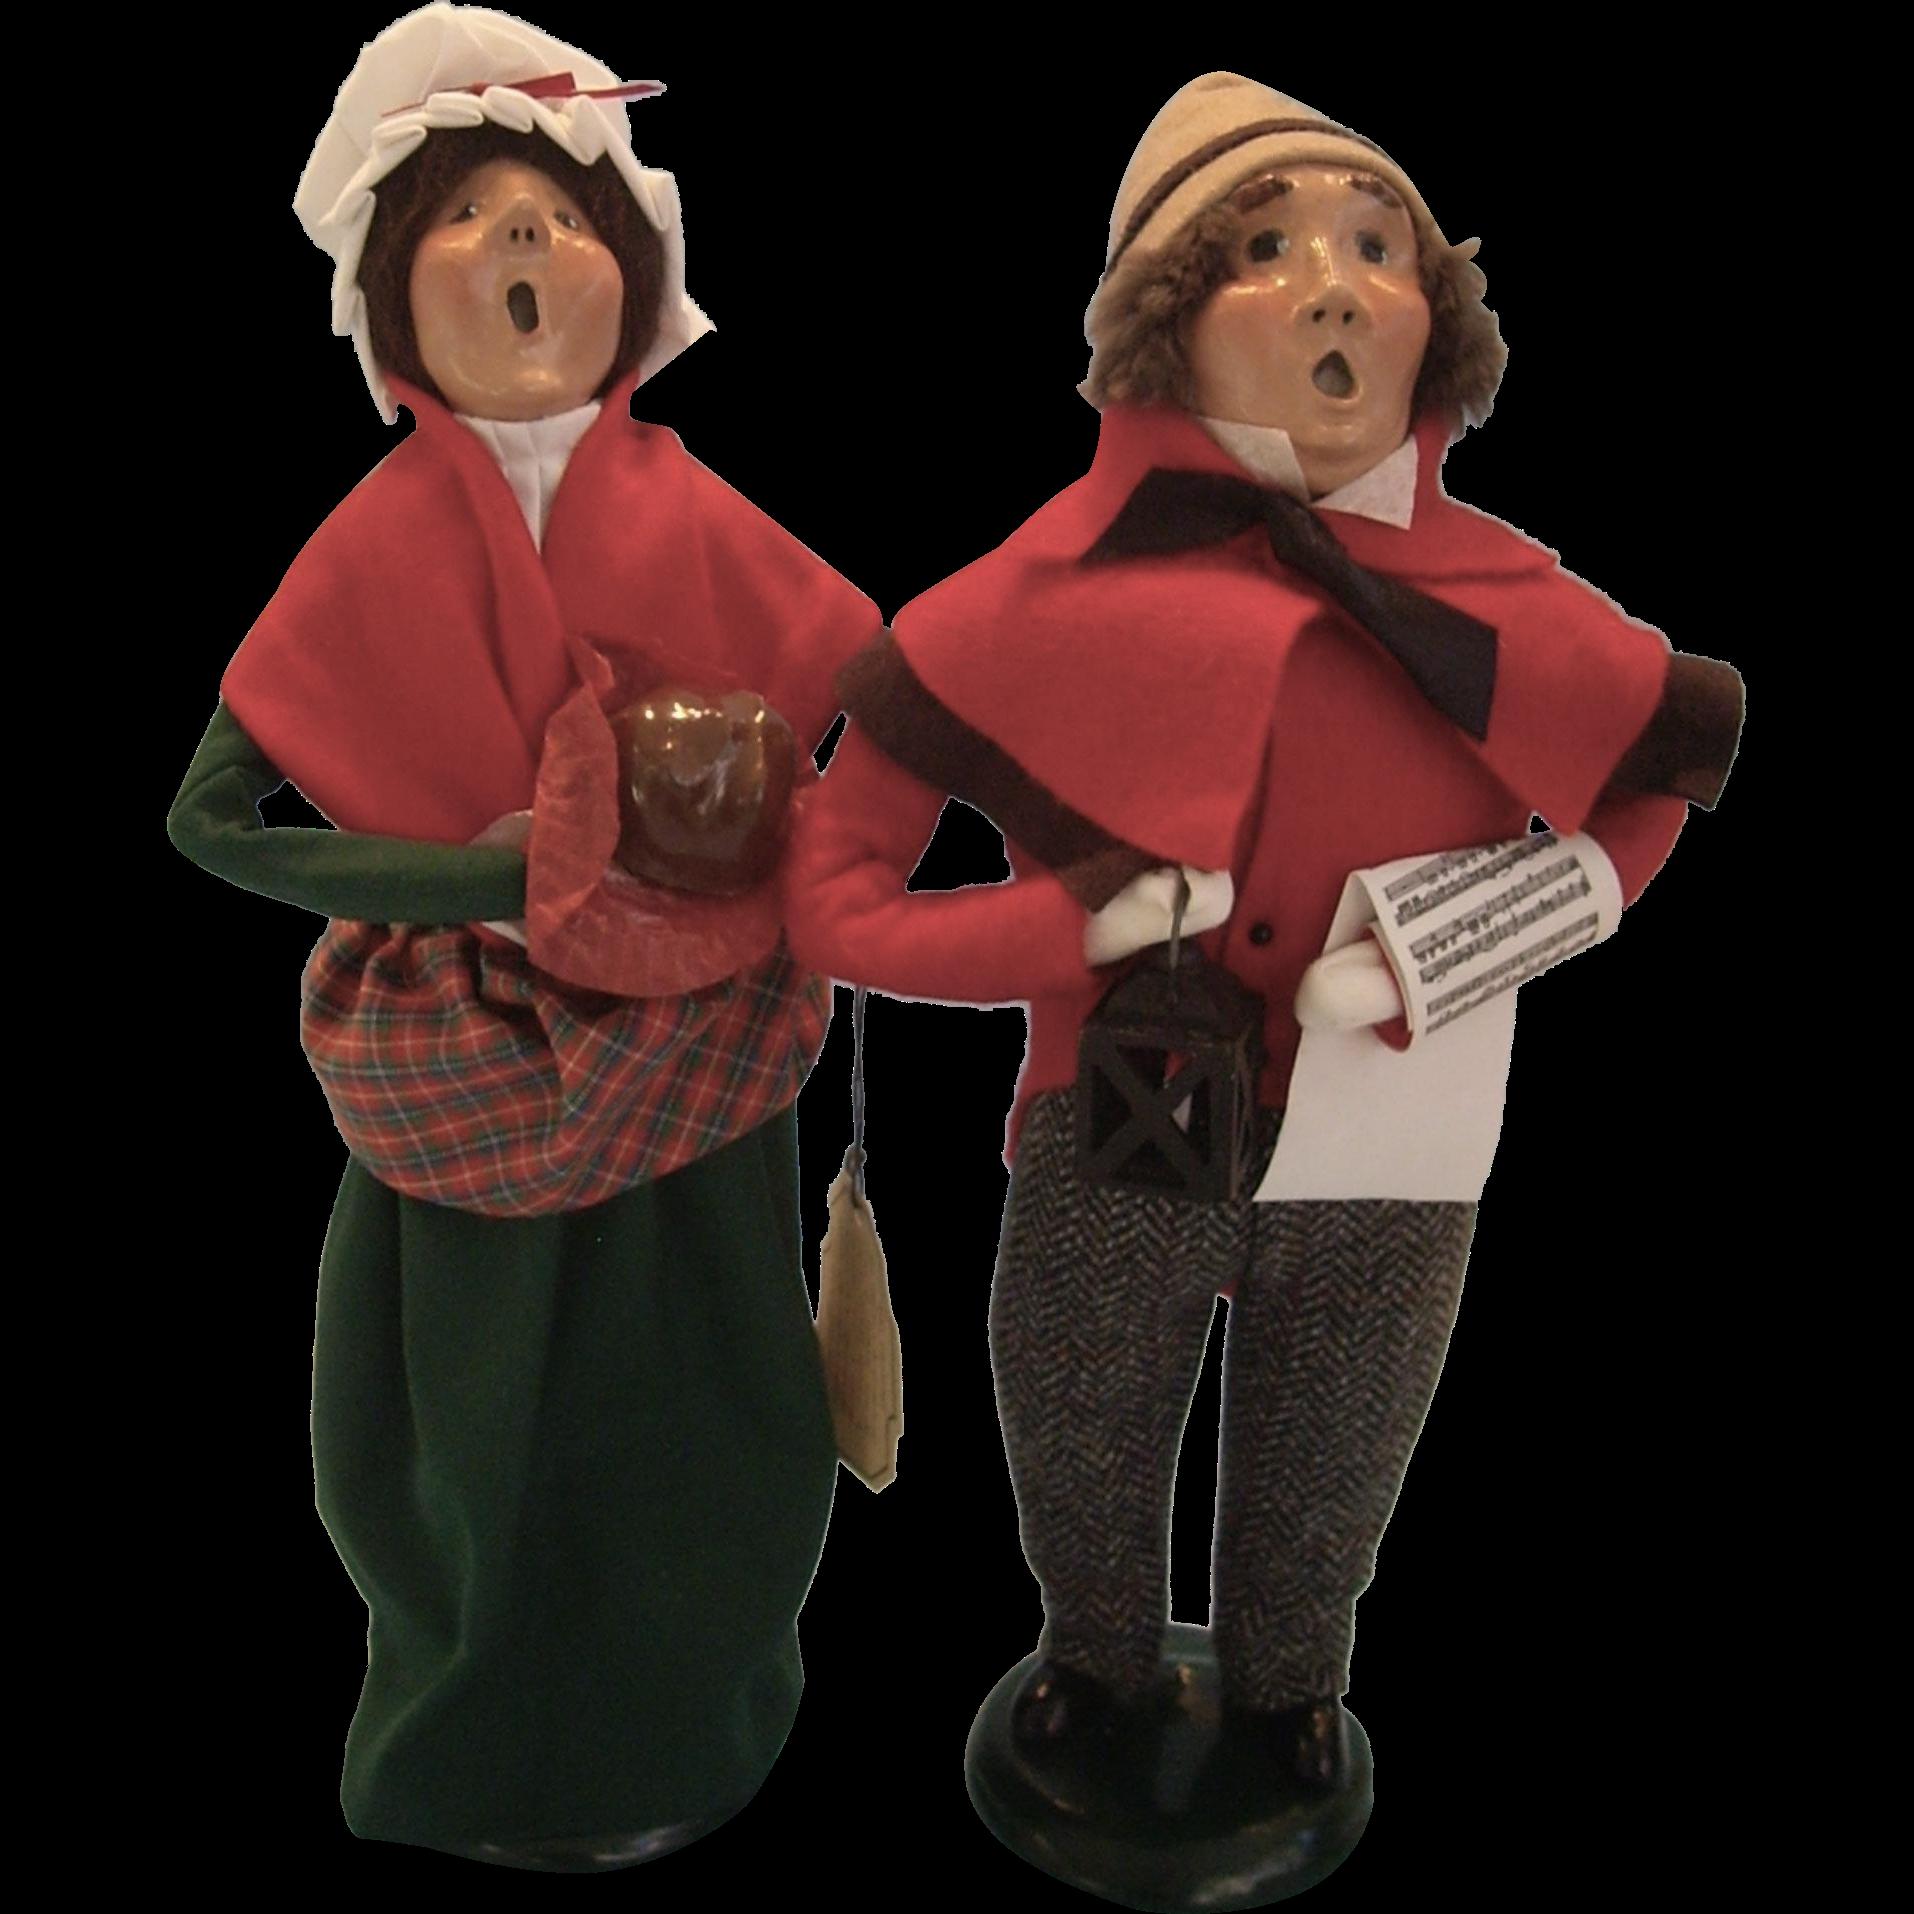 Buyers' Caroler Dolls for Christmas